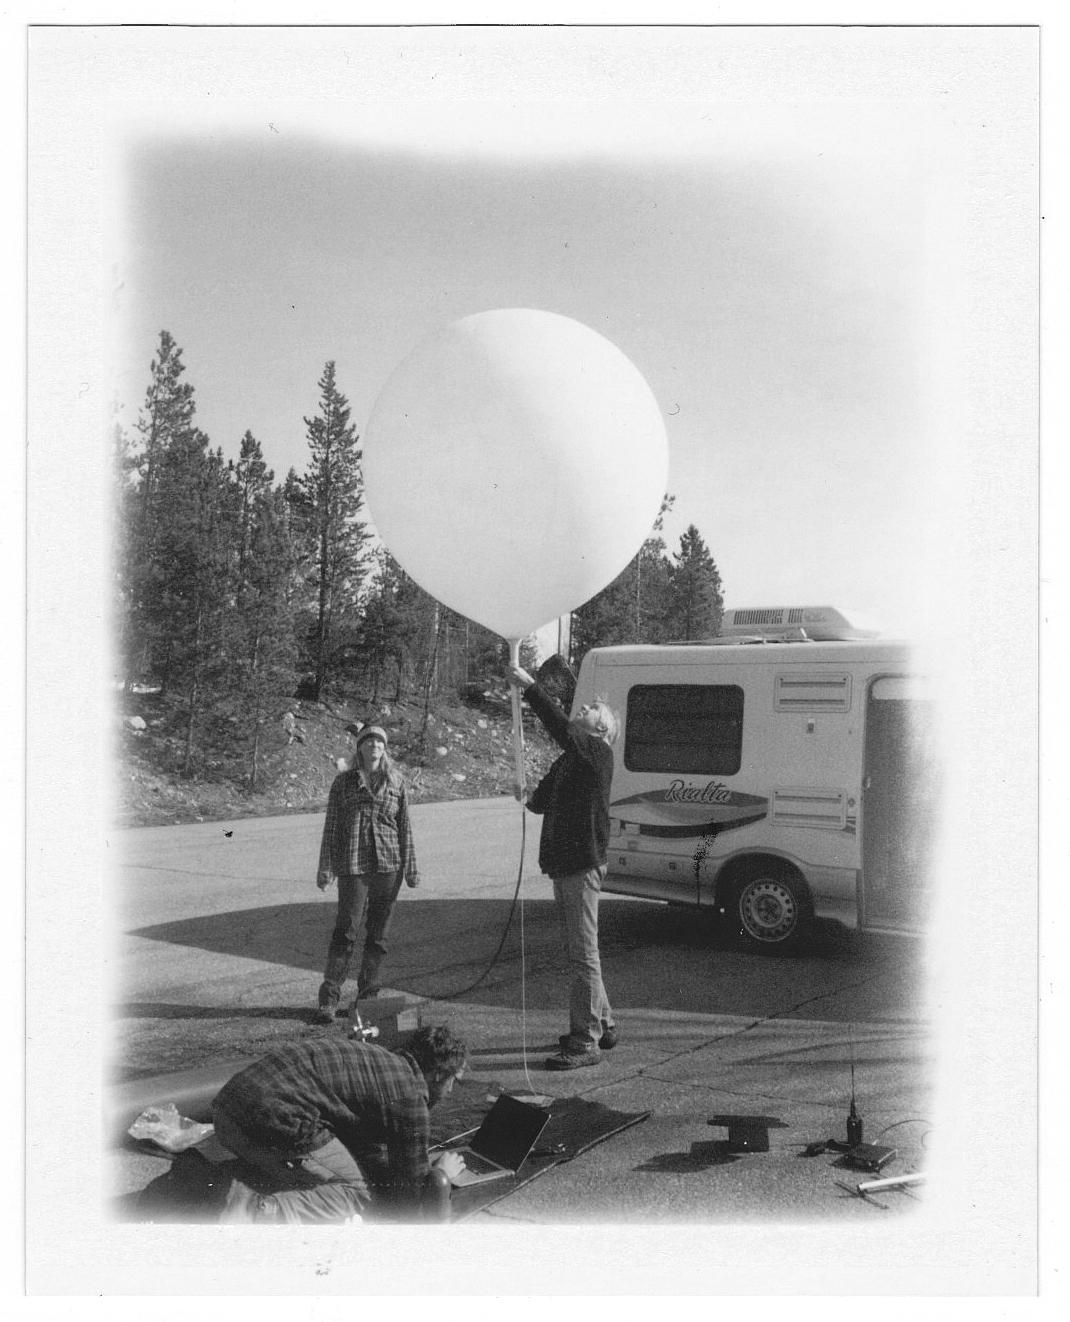 Balloon Launch FP-3000B.jpg